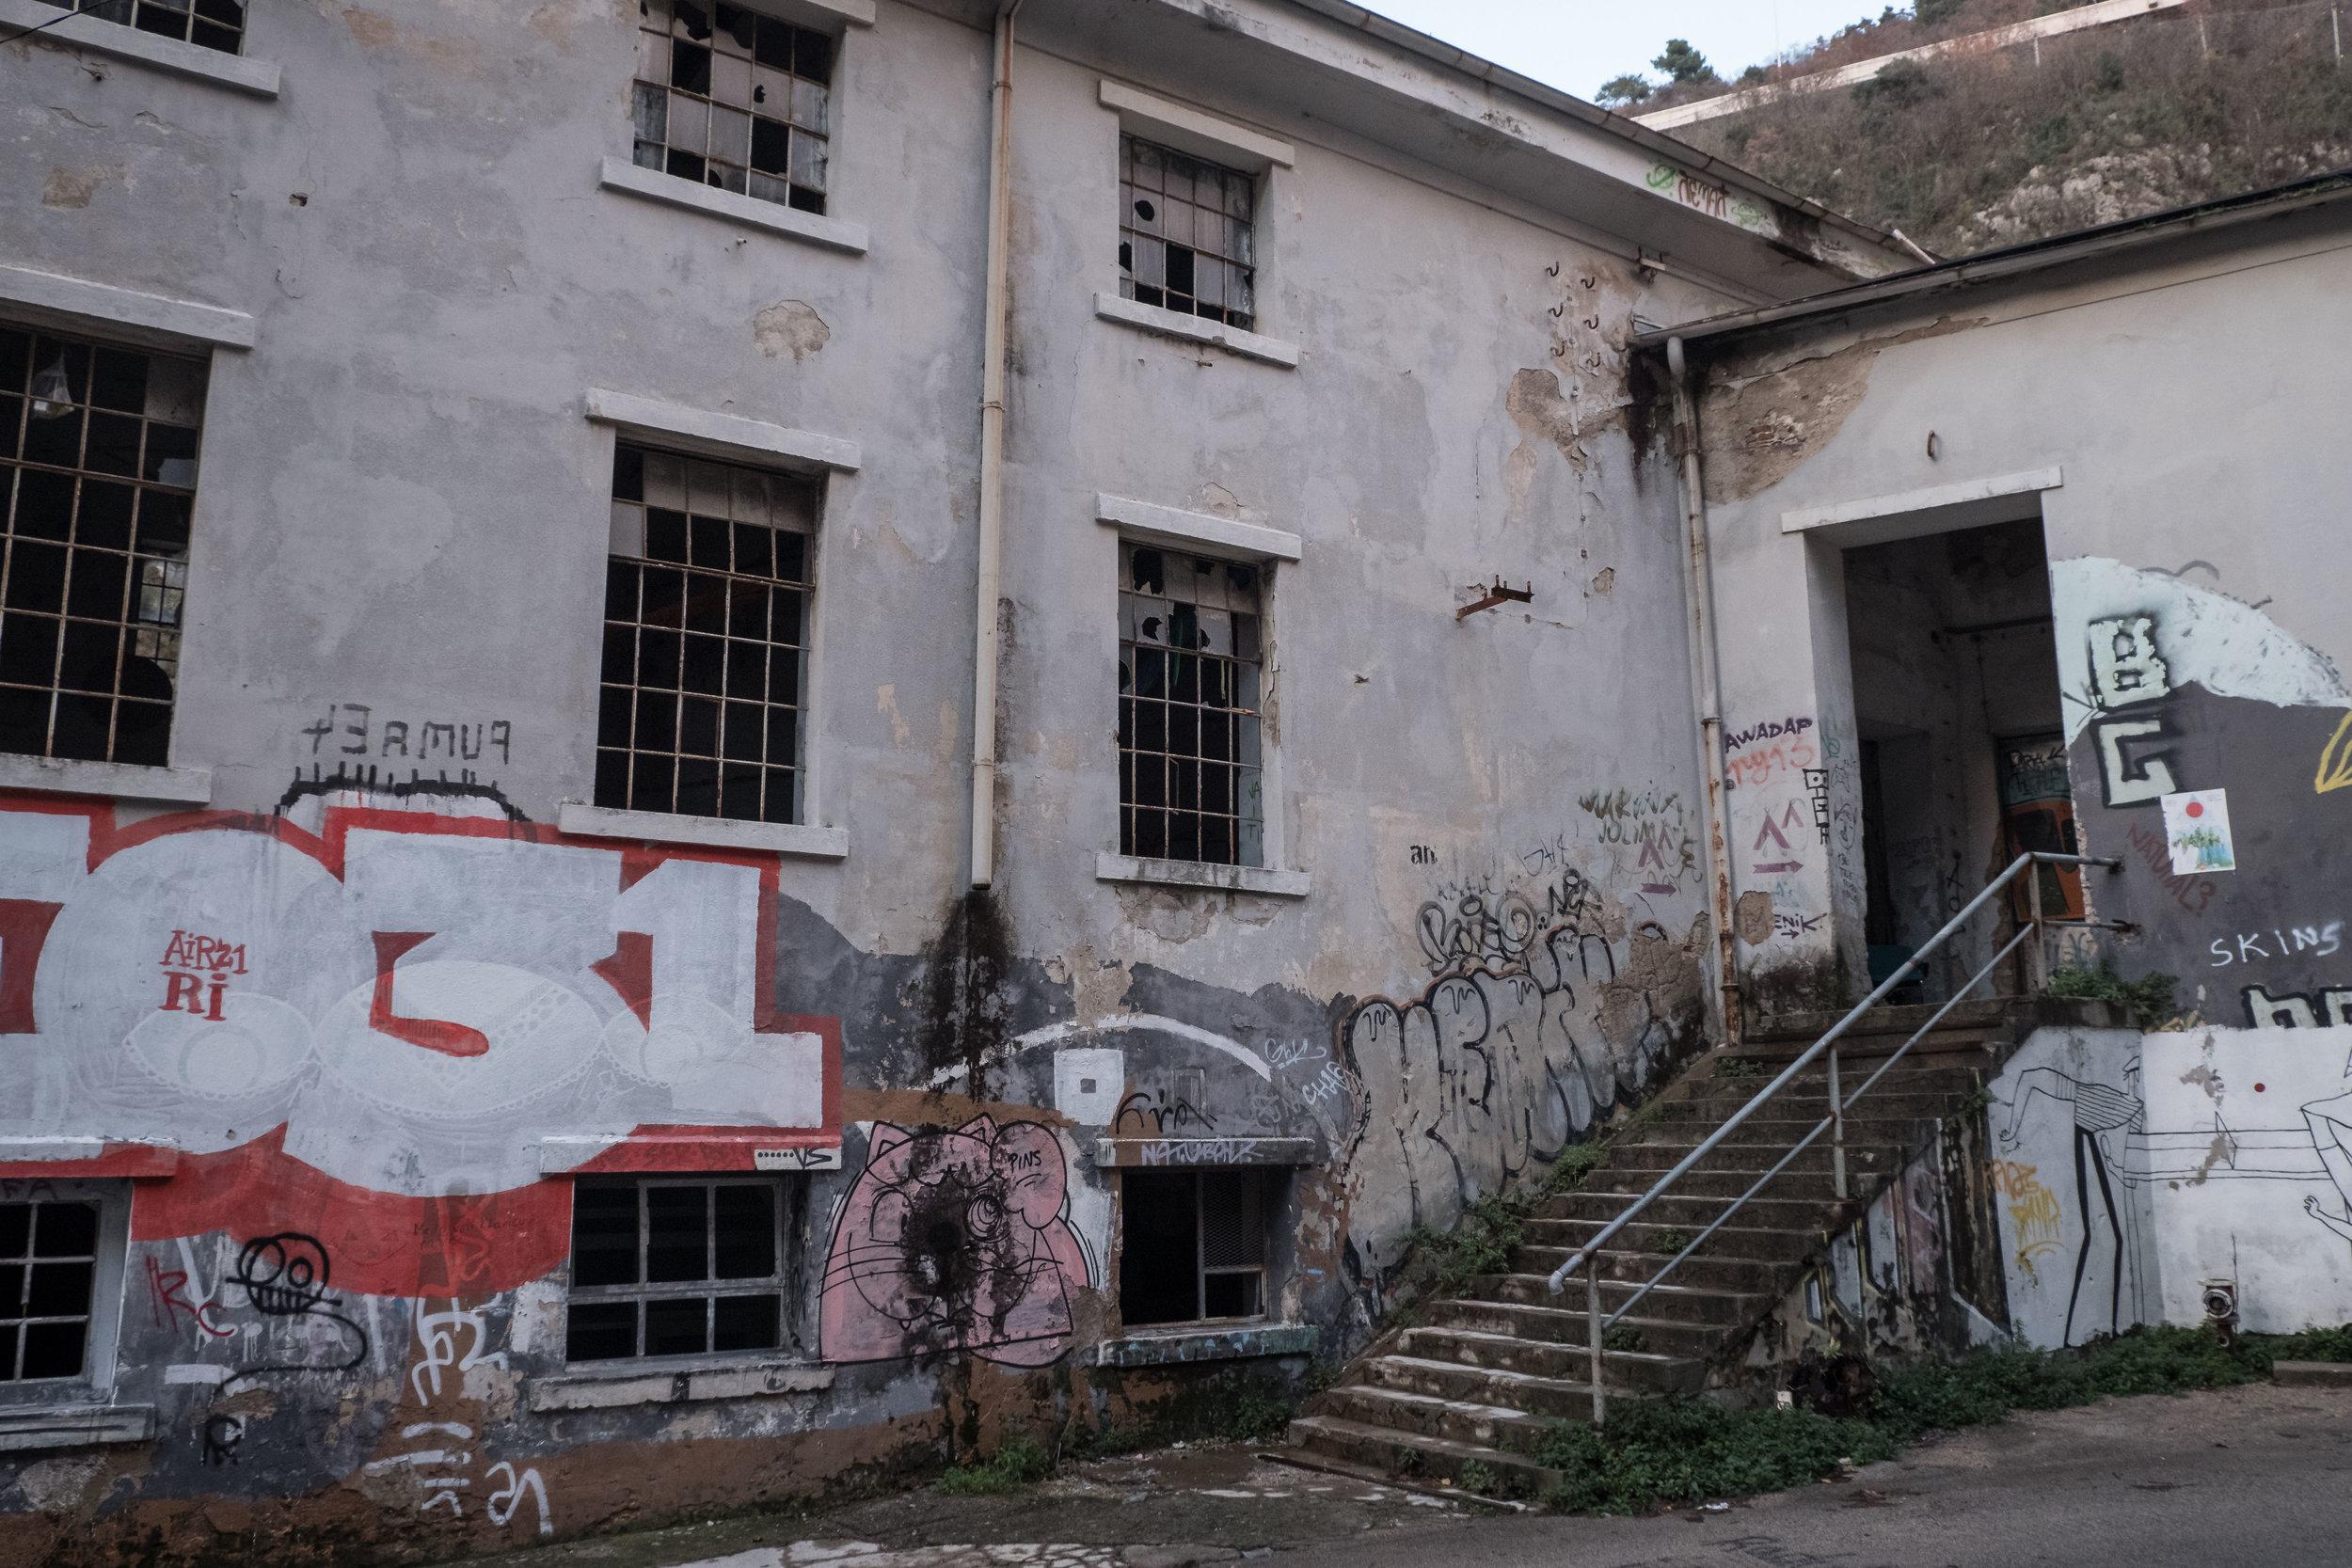 Rijeka industrial architecture3-4.jpg